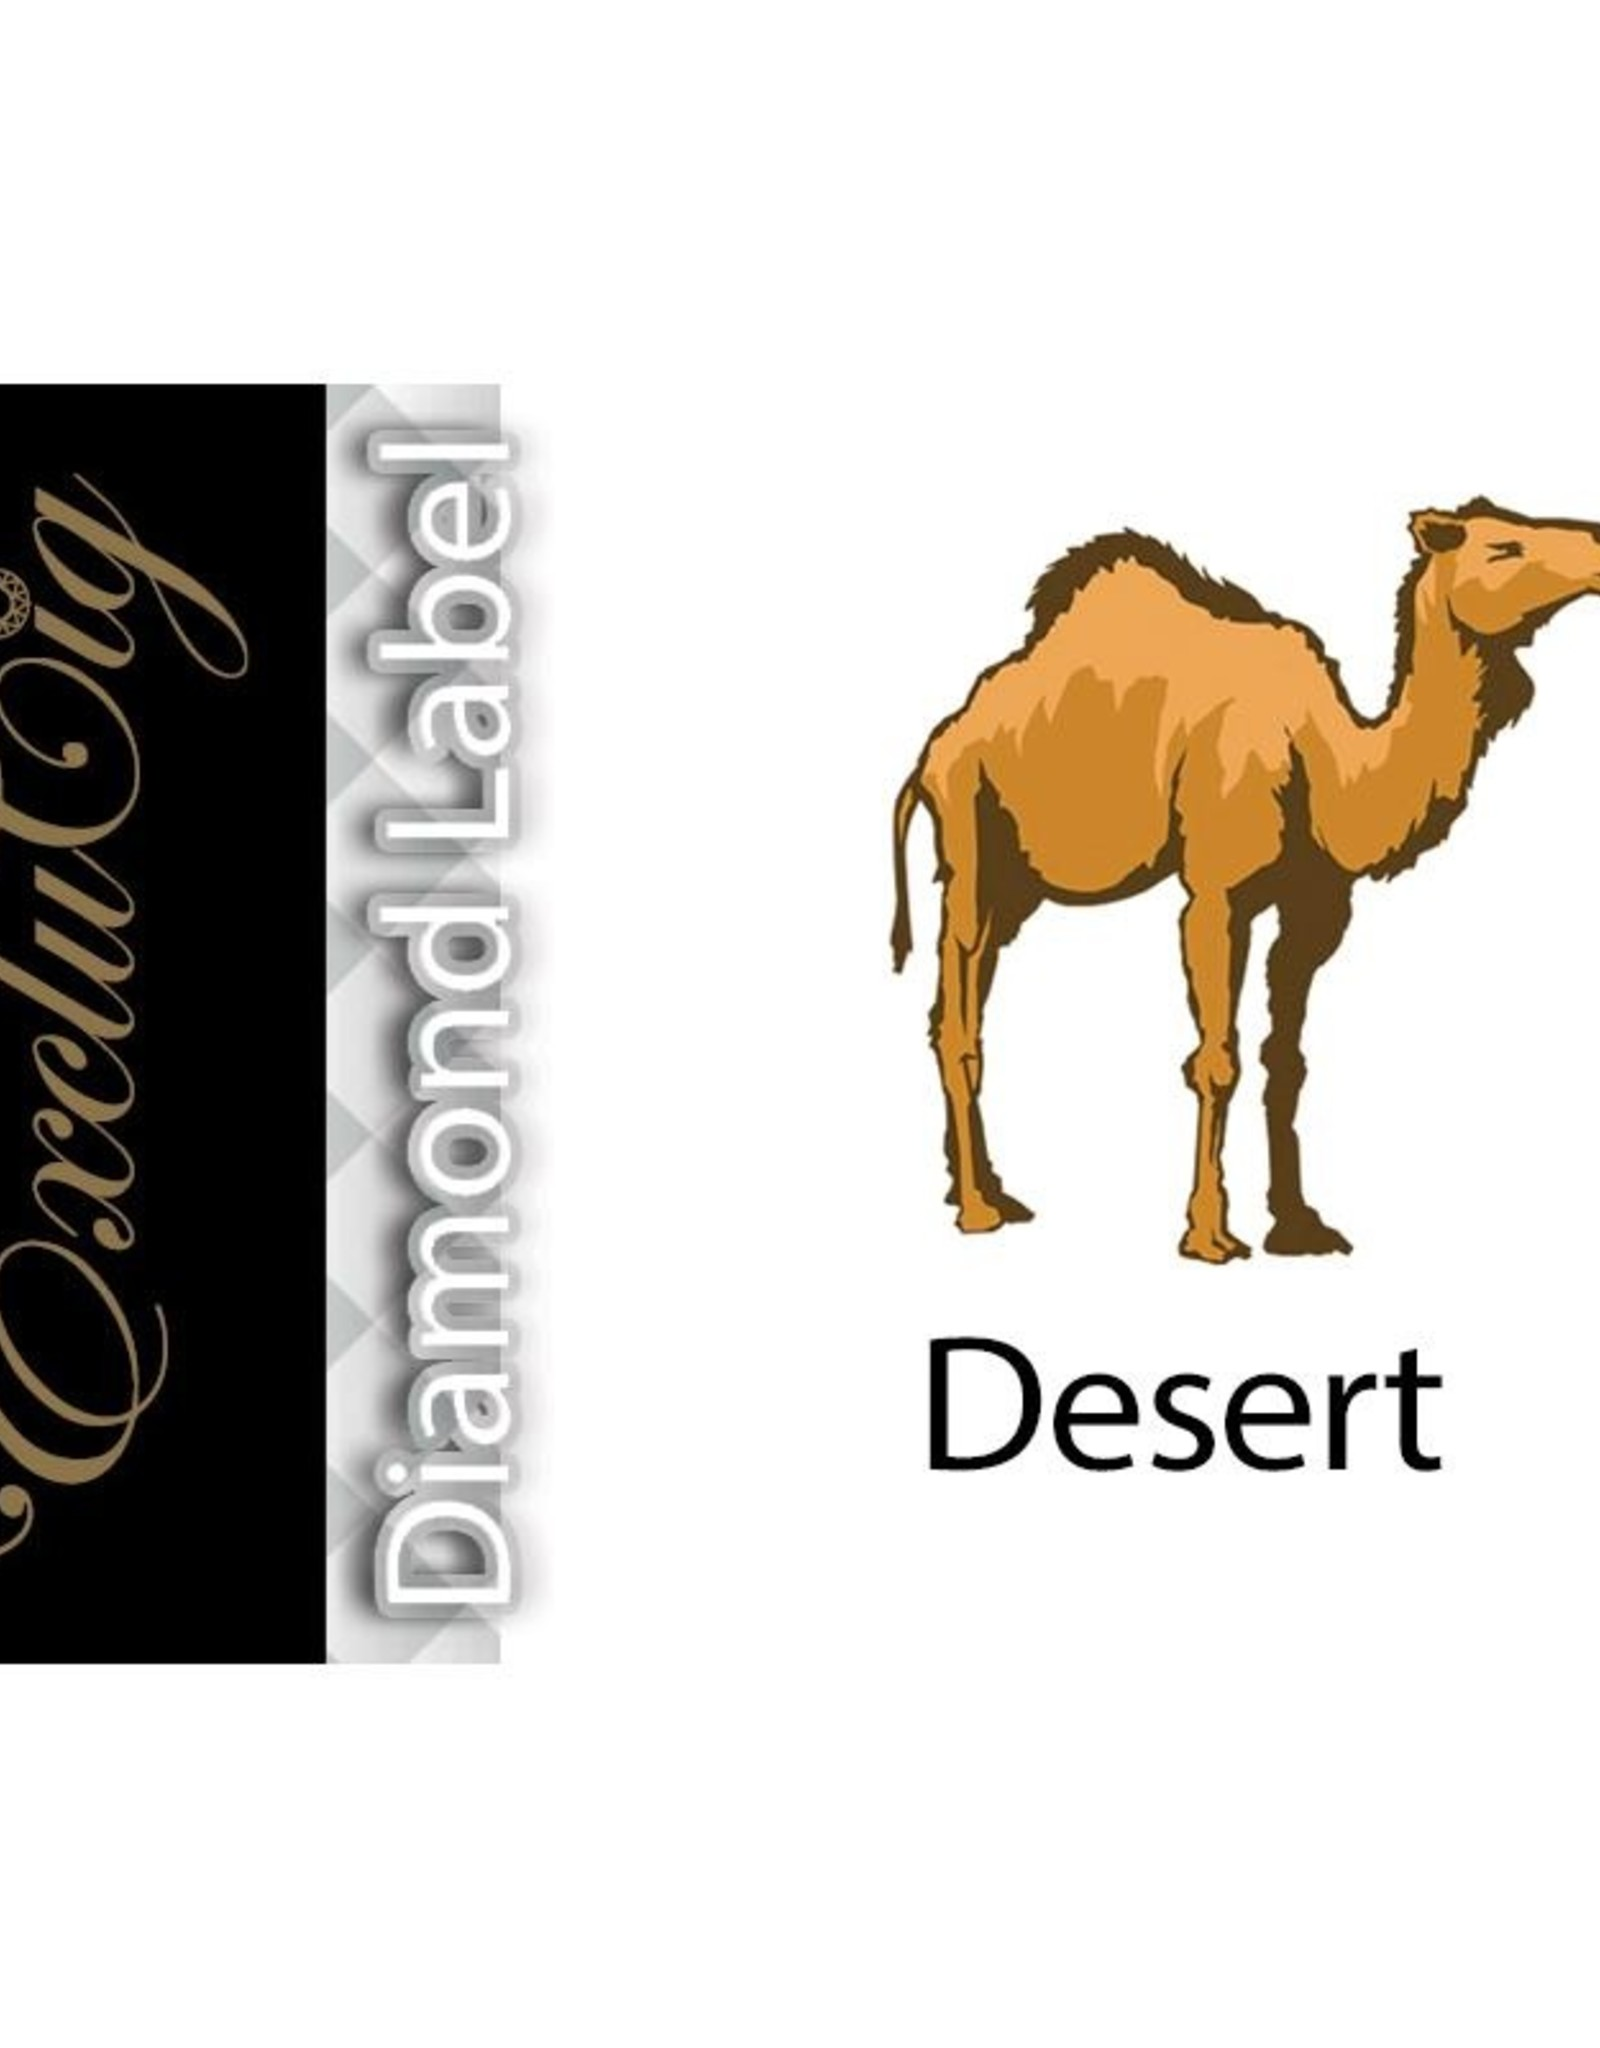 Exclucig Exclucig Diamond Label E-liquid Desert 18 mg Nicotine